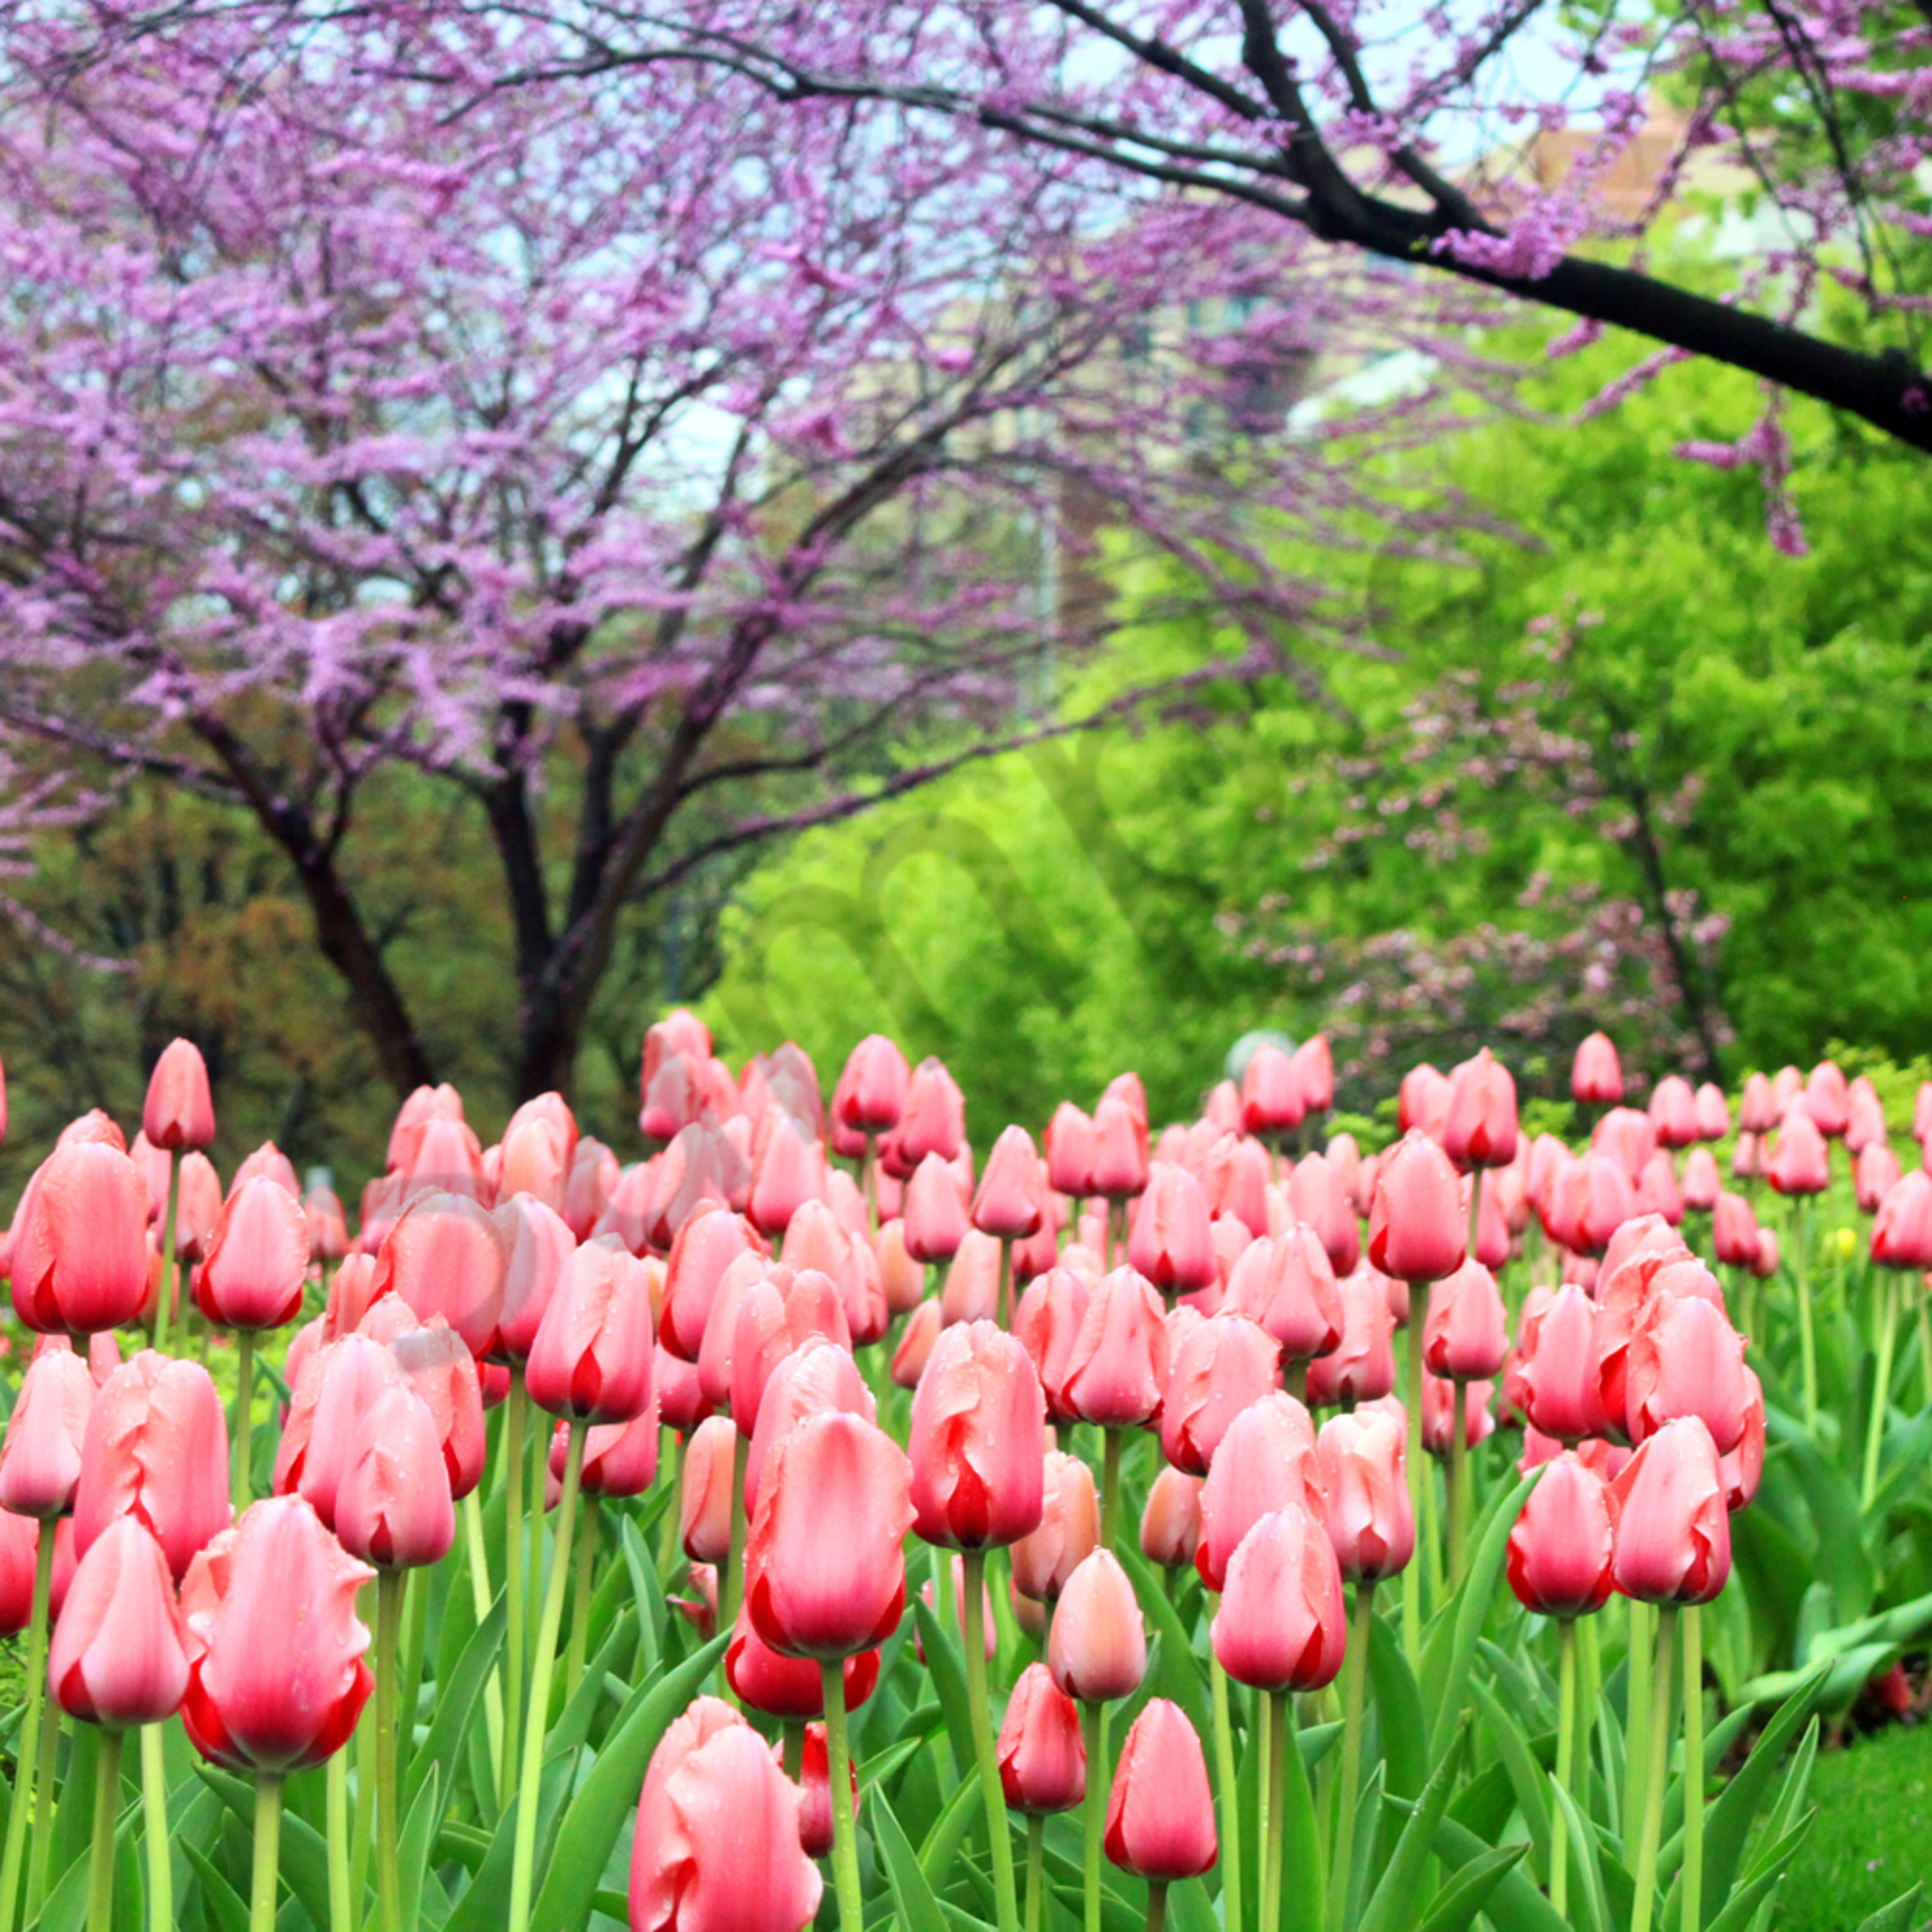 Tulips and trees website ybis8n